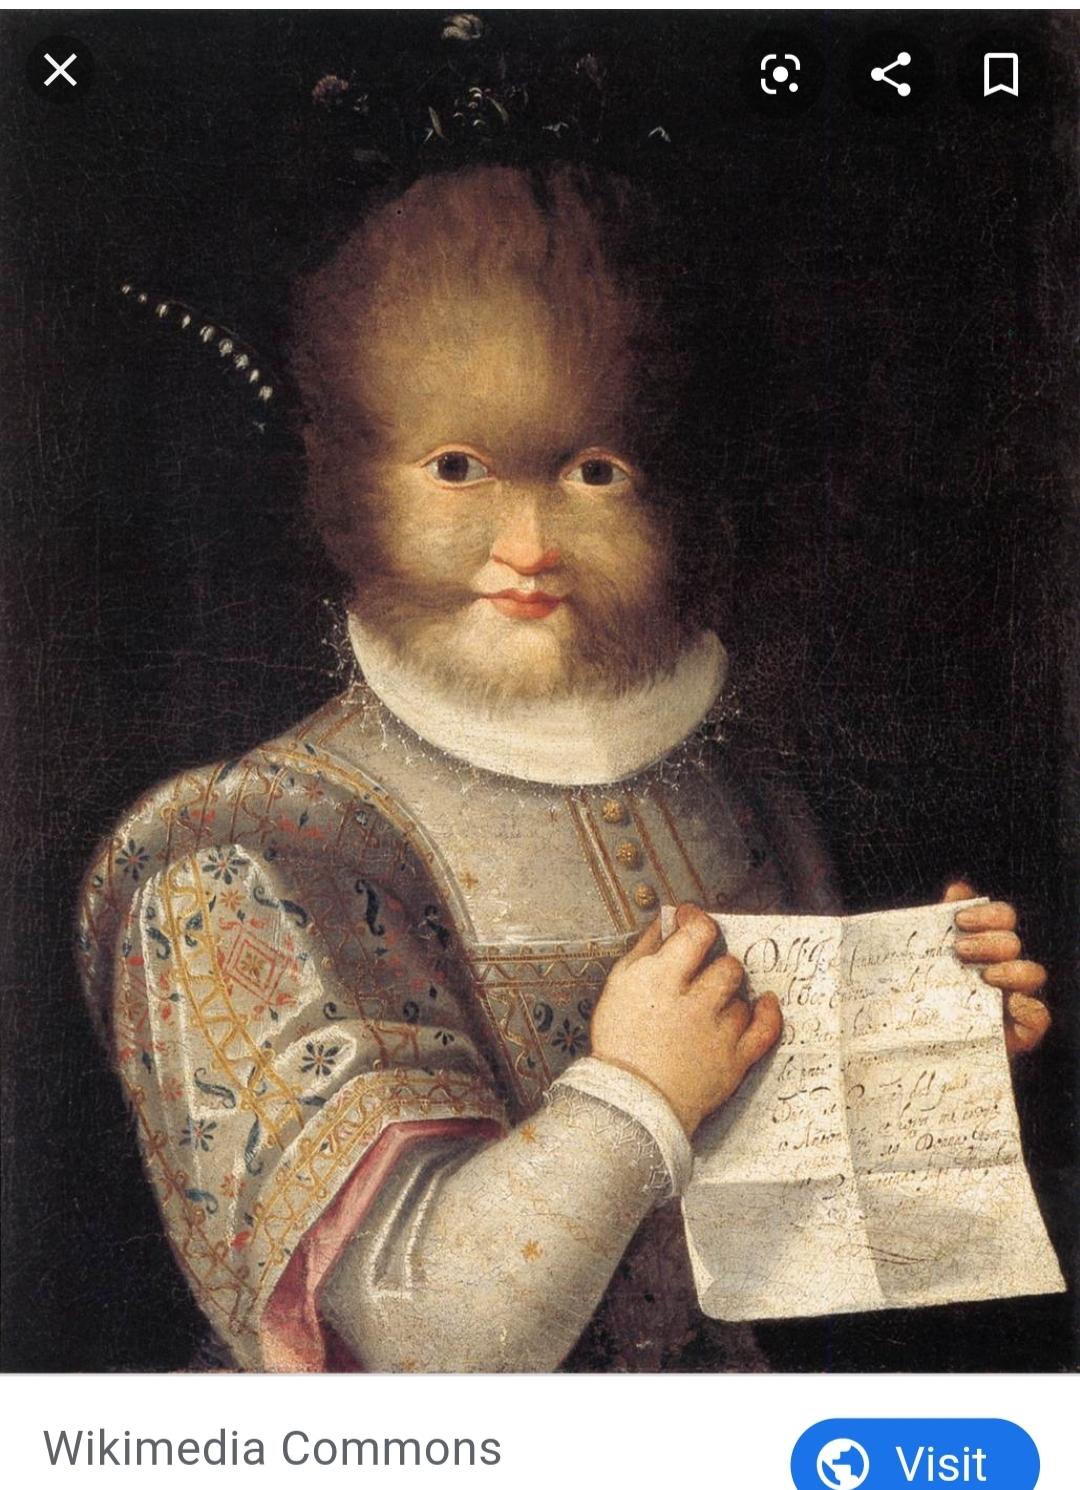 Courtesy of Wikimedia Commons